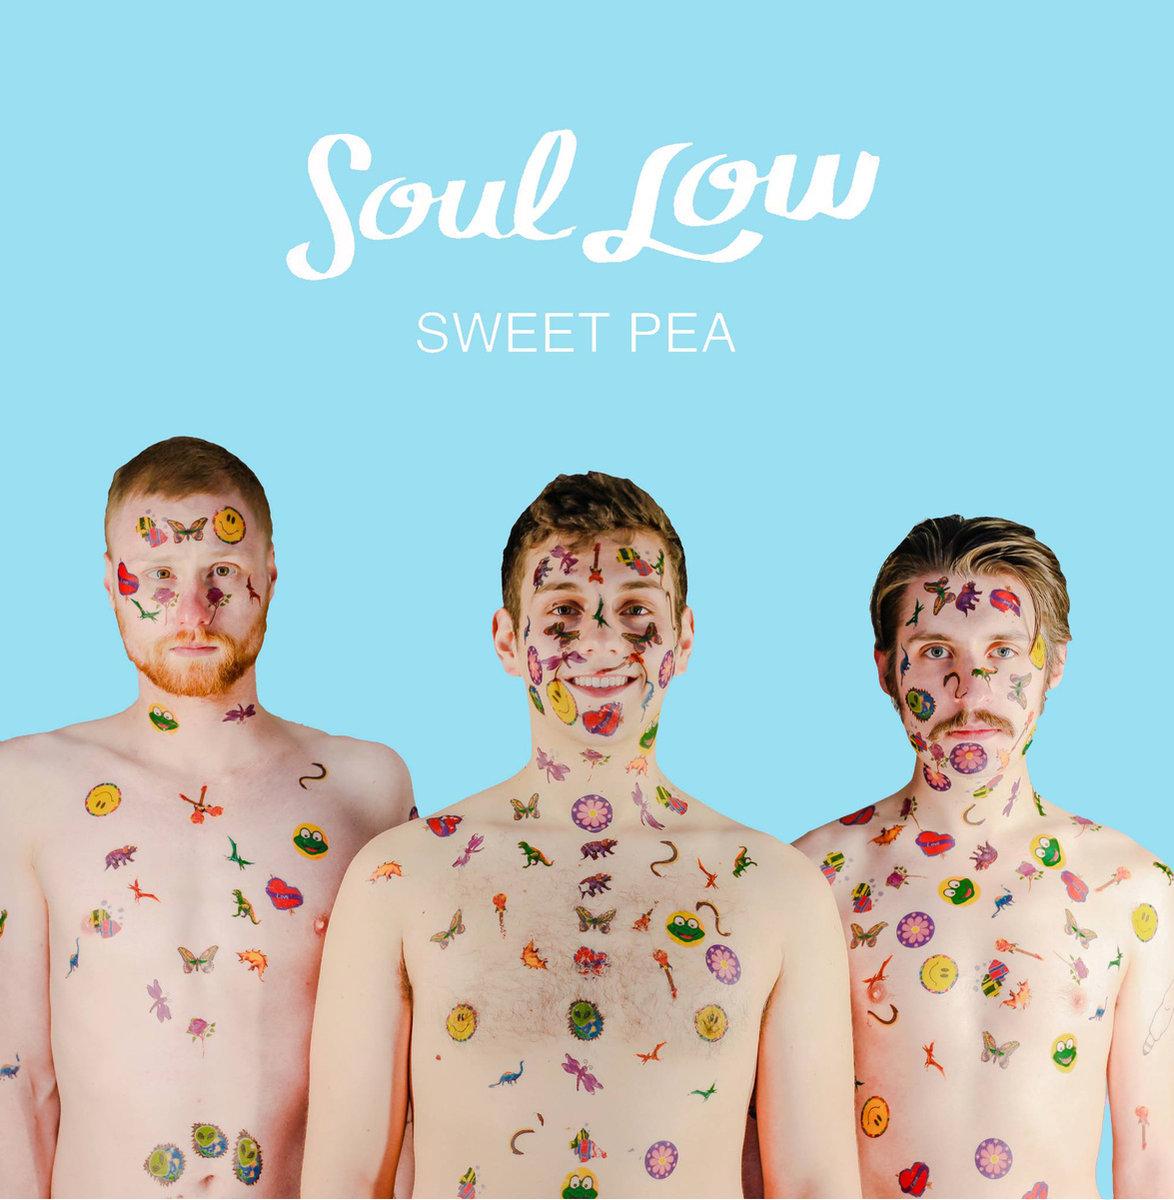 GLS006 - Soul Low - Sweet Pea